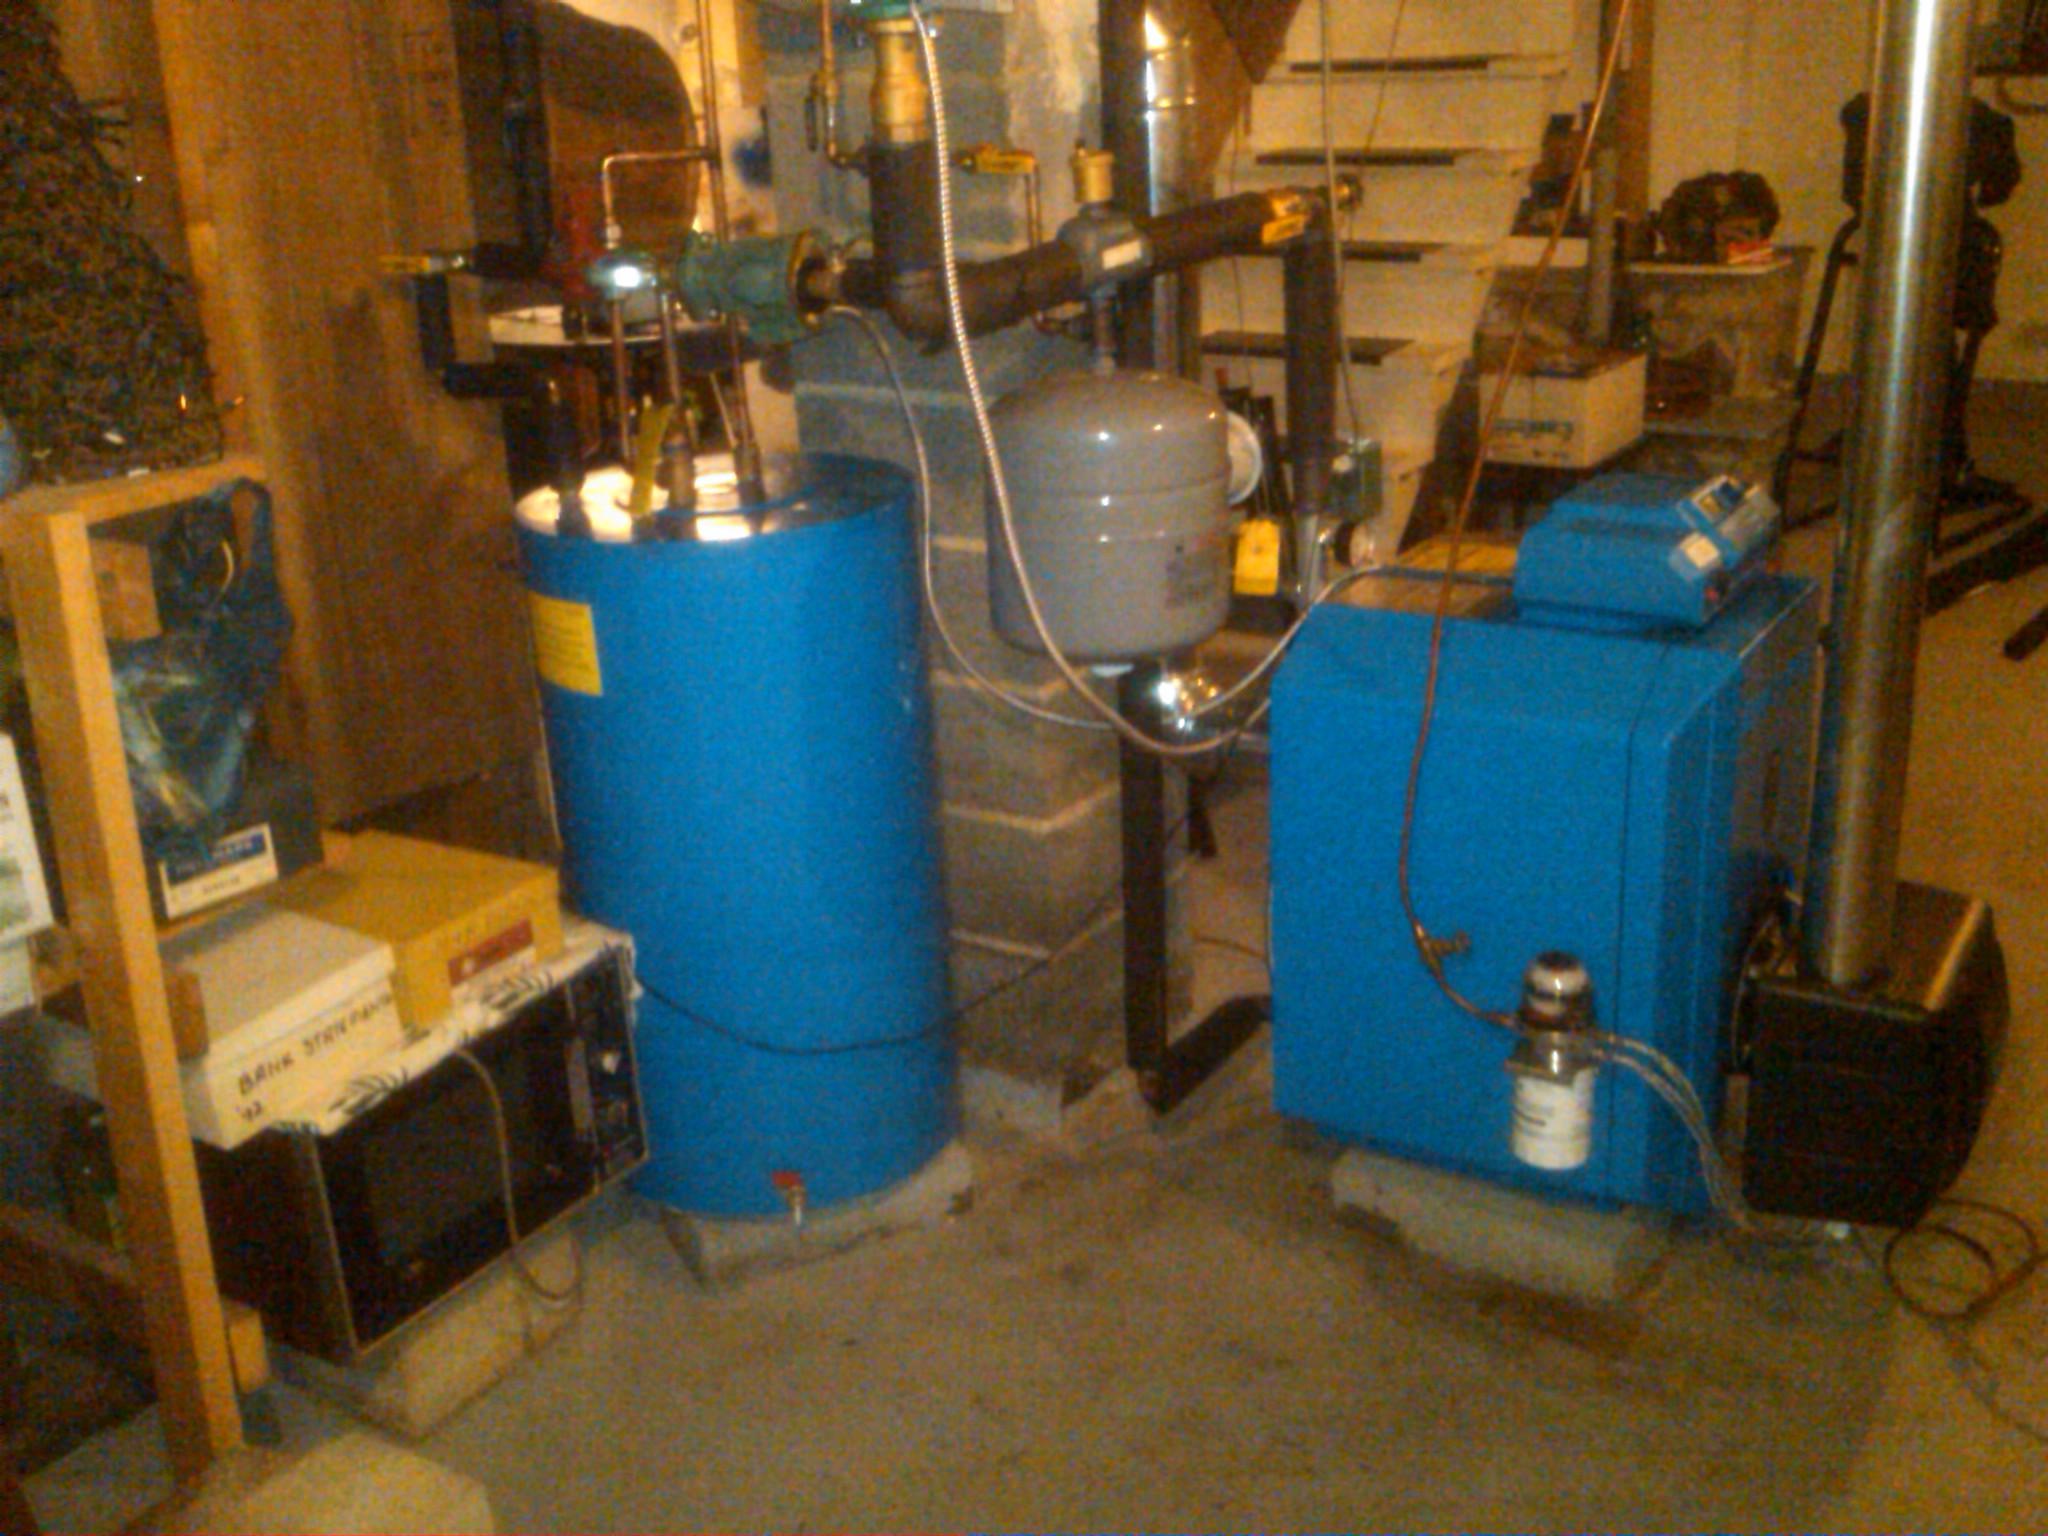 Beckett Aquasmart Vs  Logamatic  U2014 Heating Help  The Wall